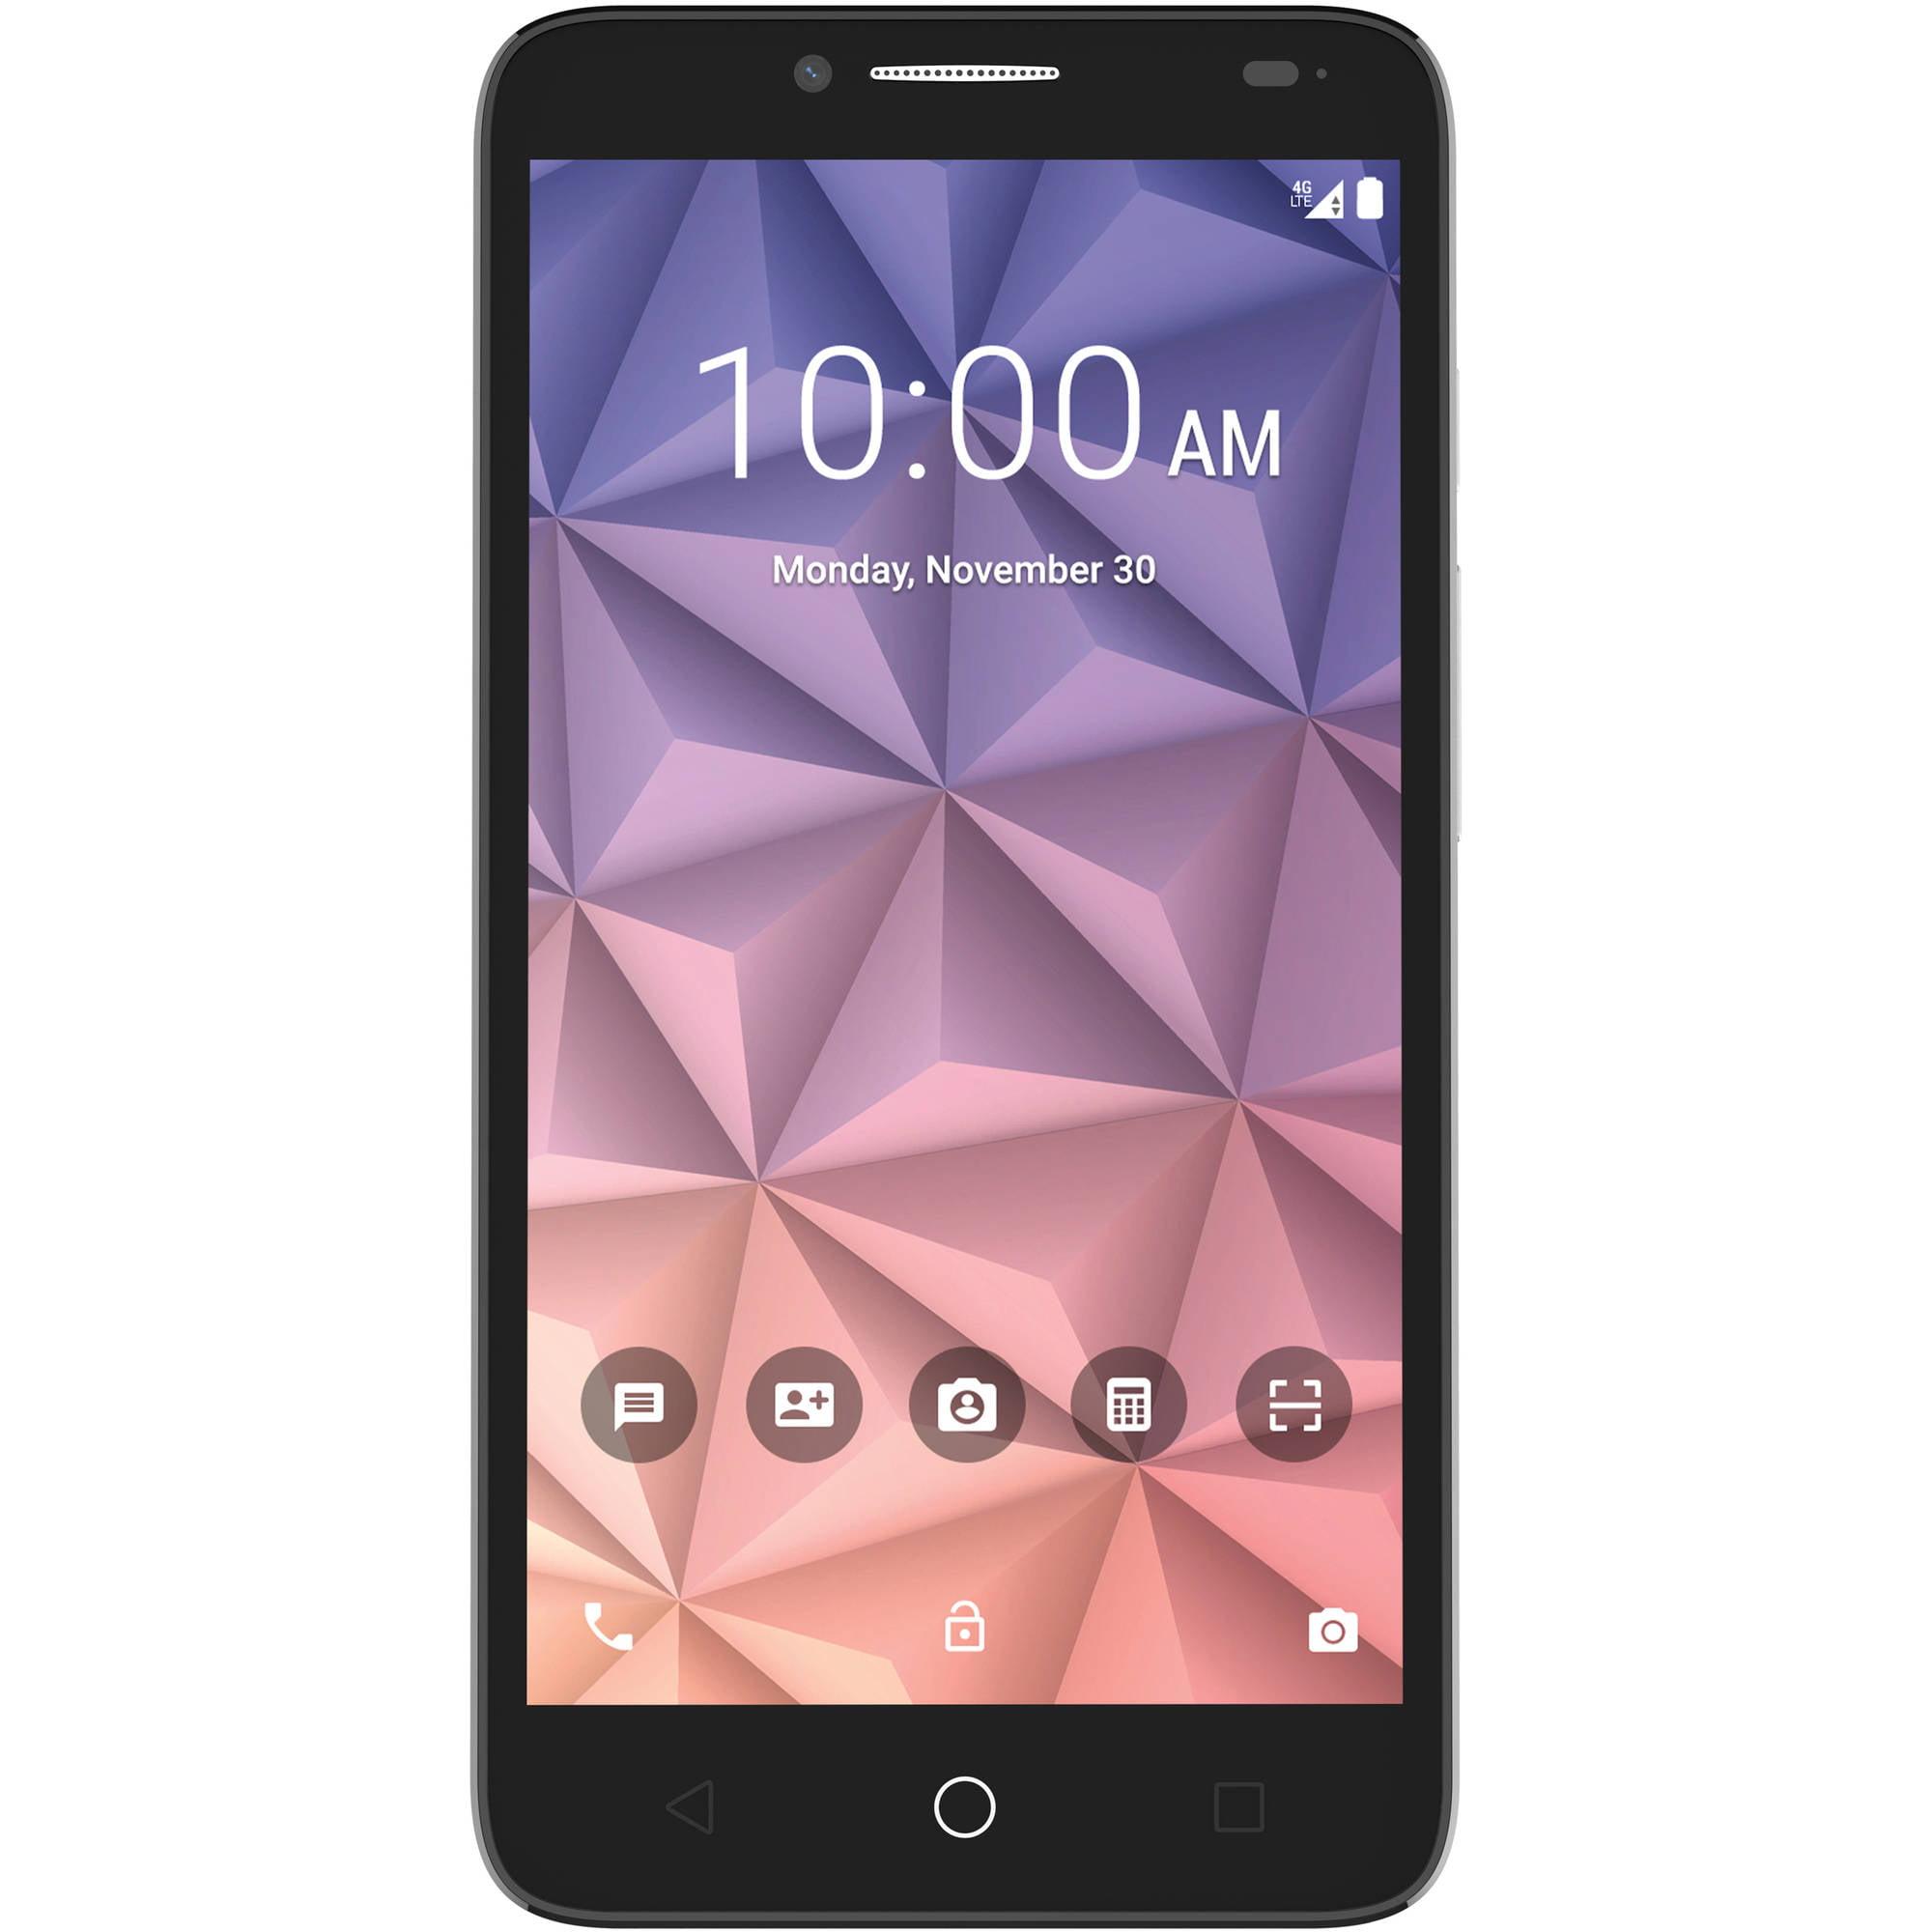 T-Mobile ALCATEL ONETOUCH Fierce XL Prepaid Smartphone